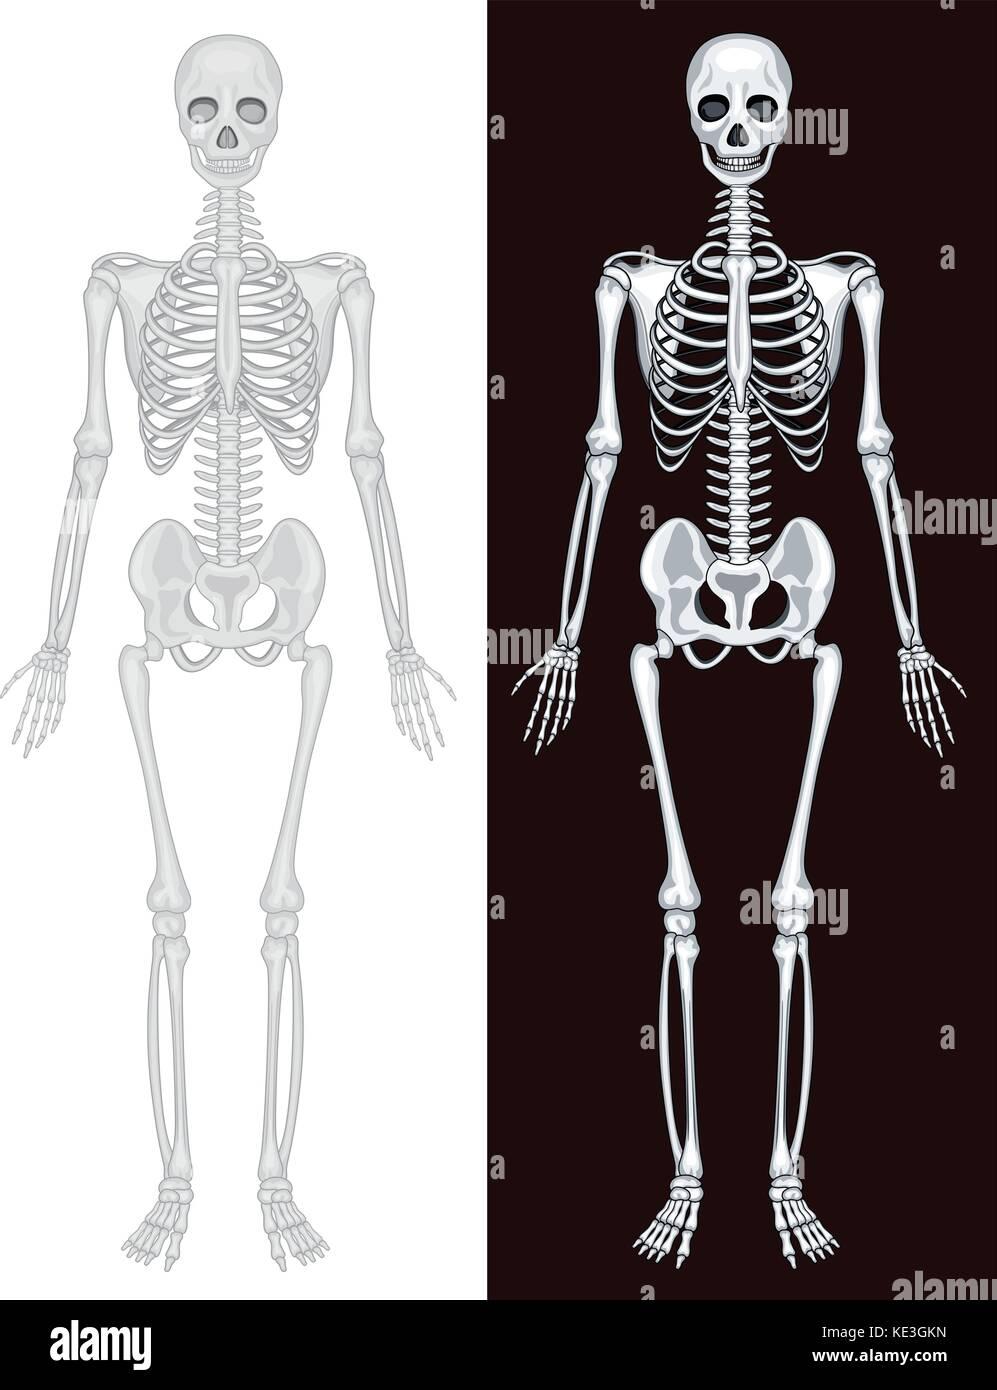 Human Skeleton In White And Black Background Illustration Stock